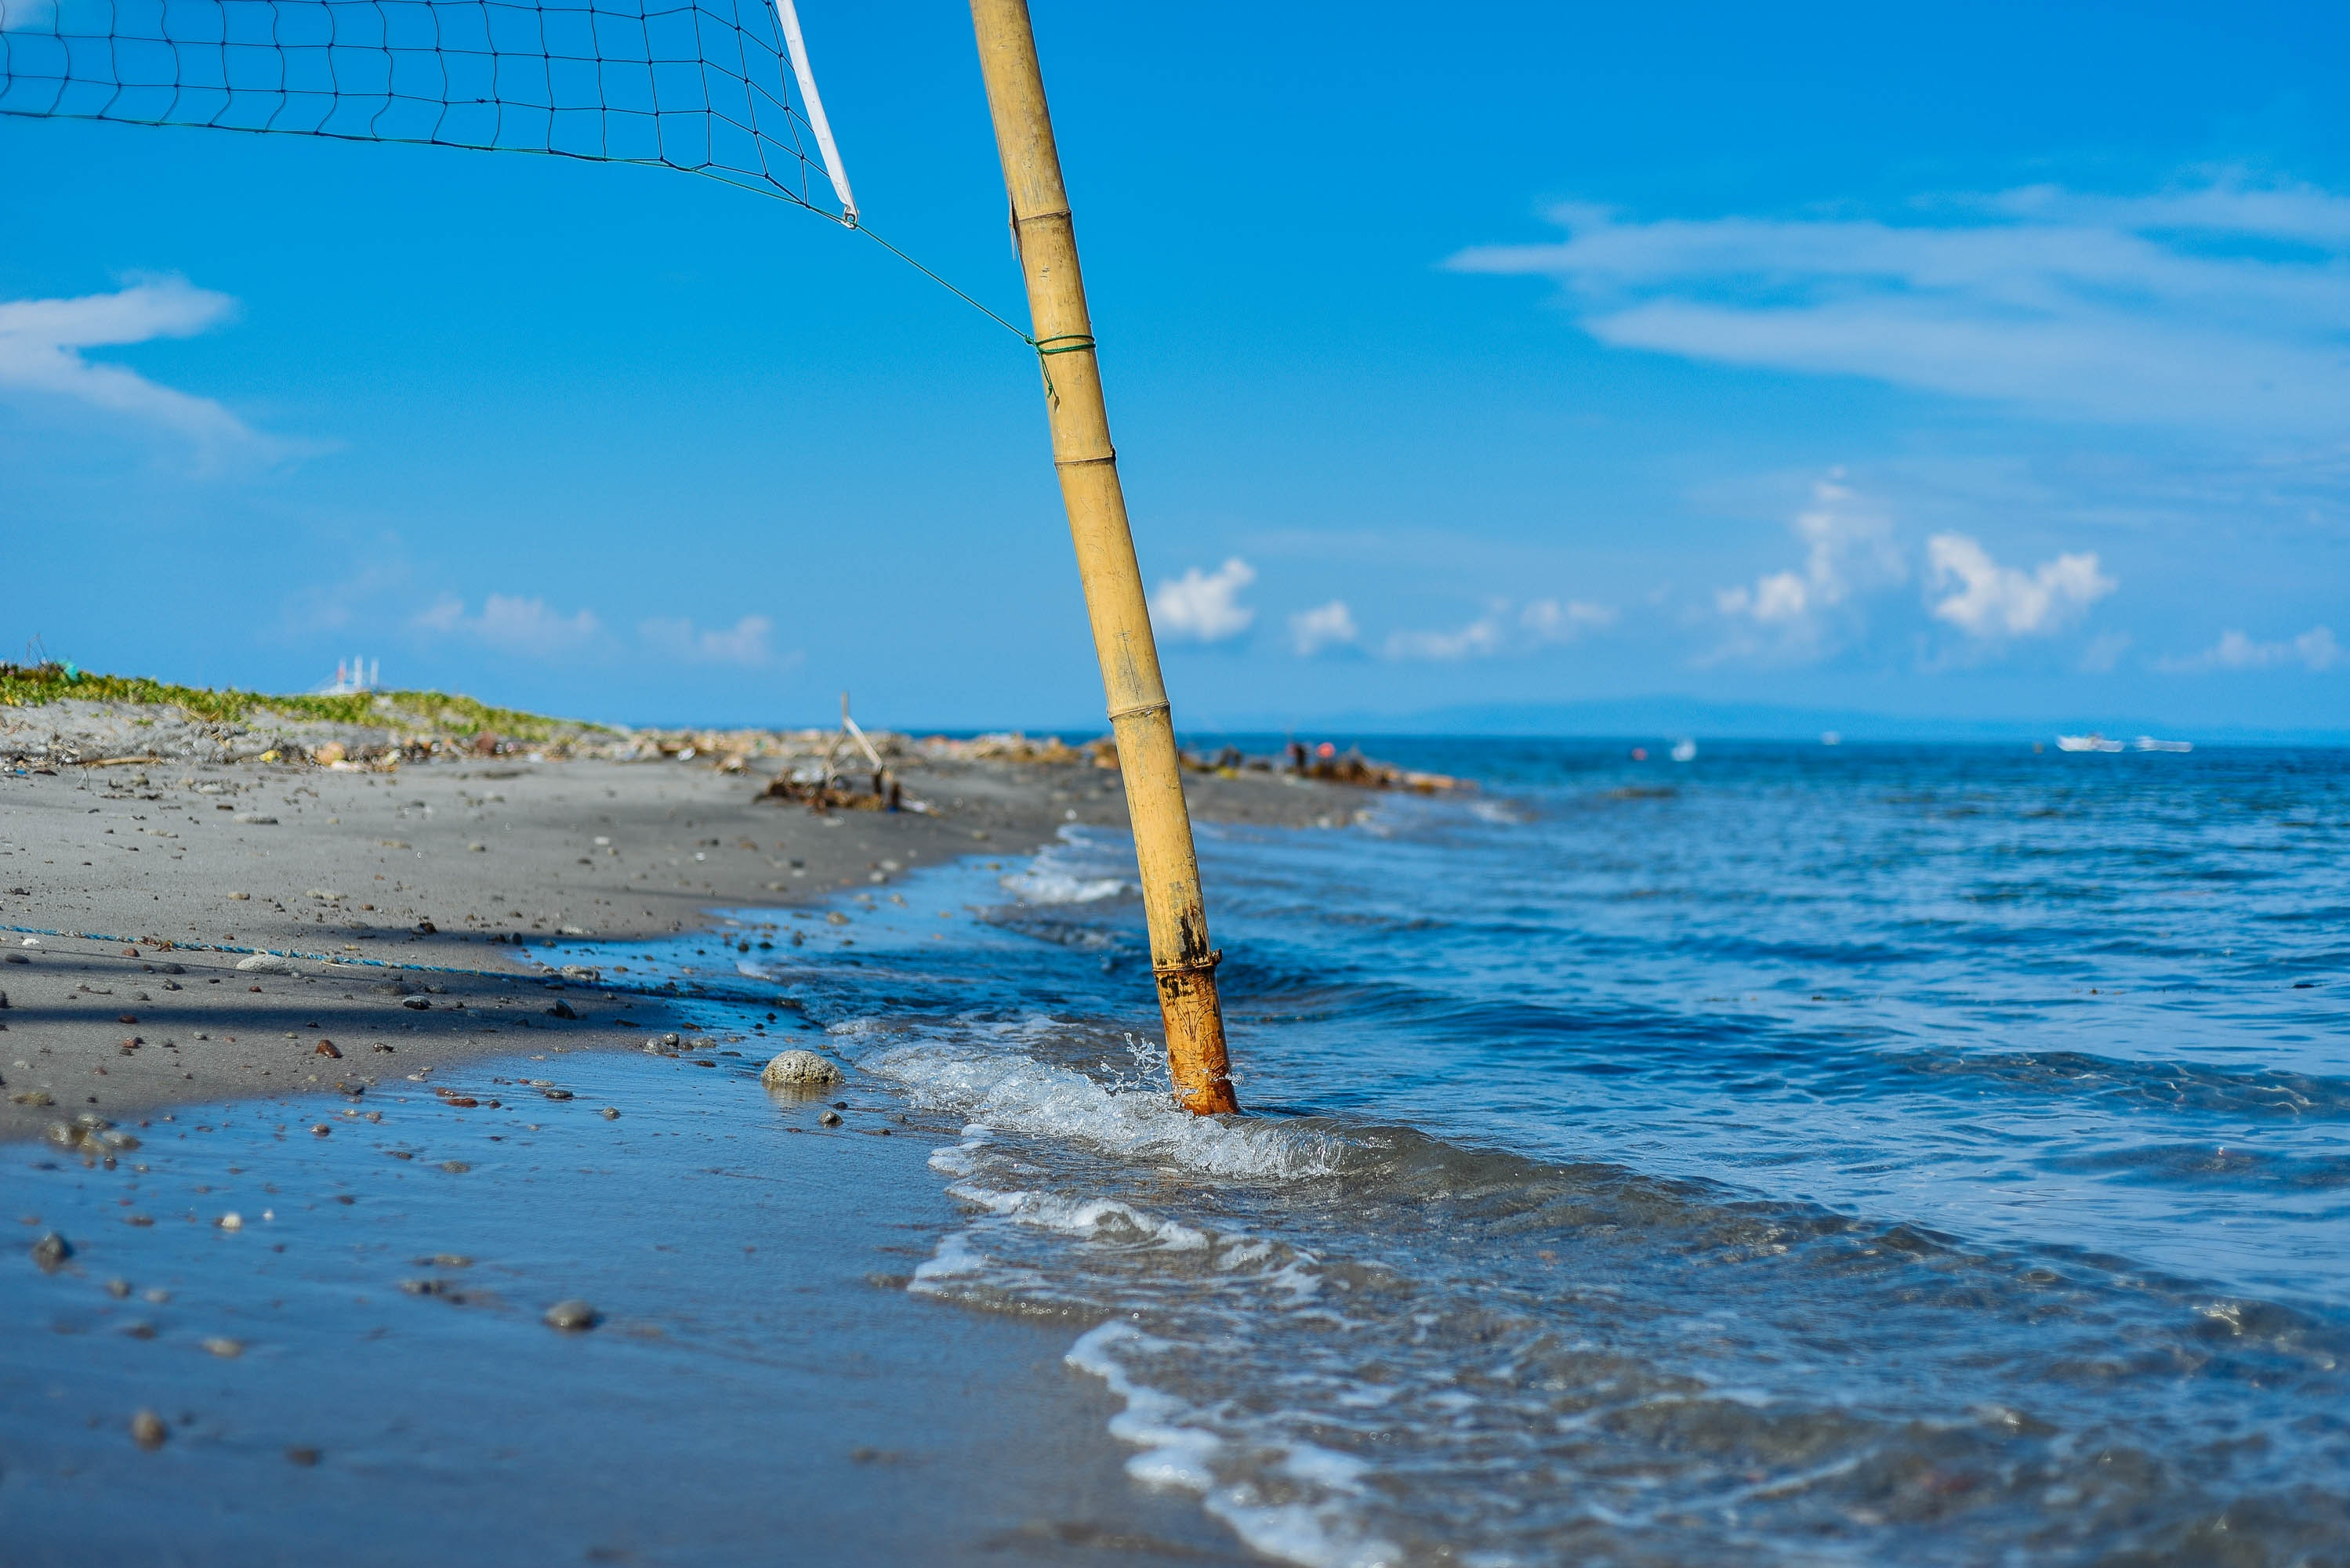 Closeup Photo of Brown Bamboo Beach Volleyball Post Near Shoreline, Bamboo, Beach, Clouds, Daytime, HQ Photo